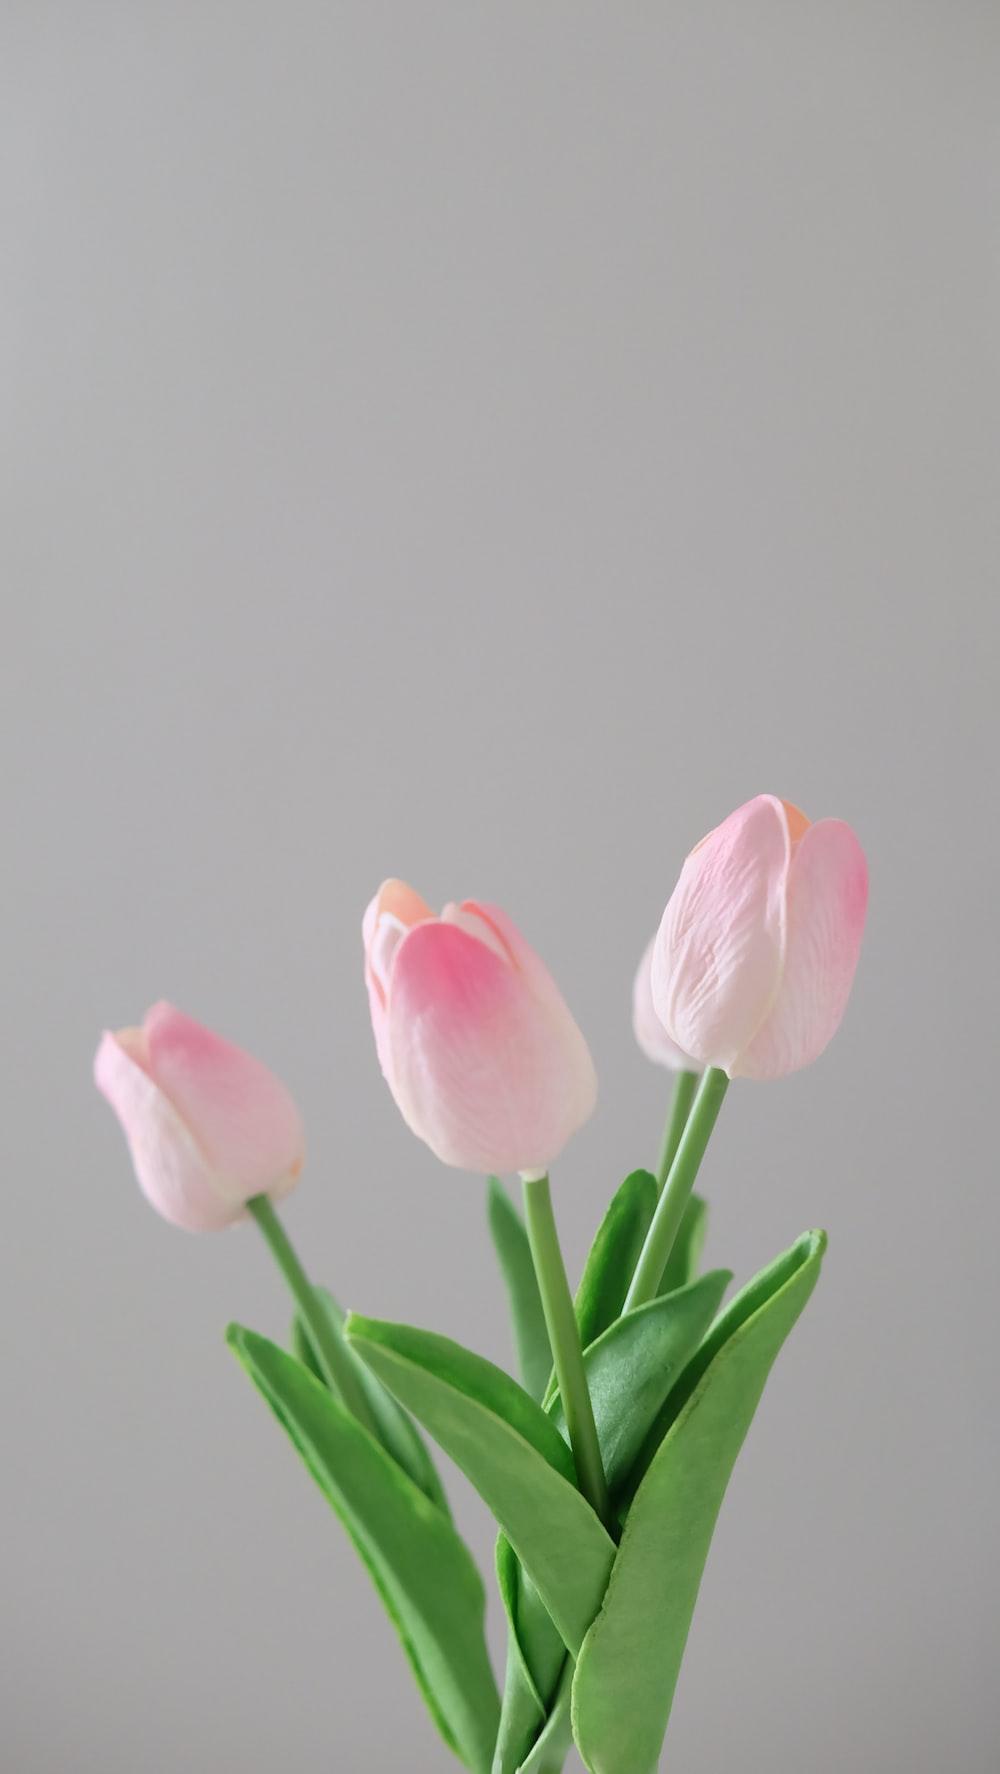 three pink tulip flowers